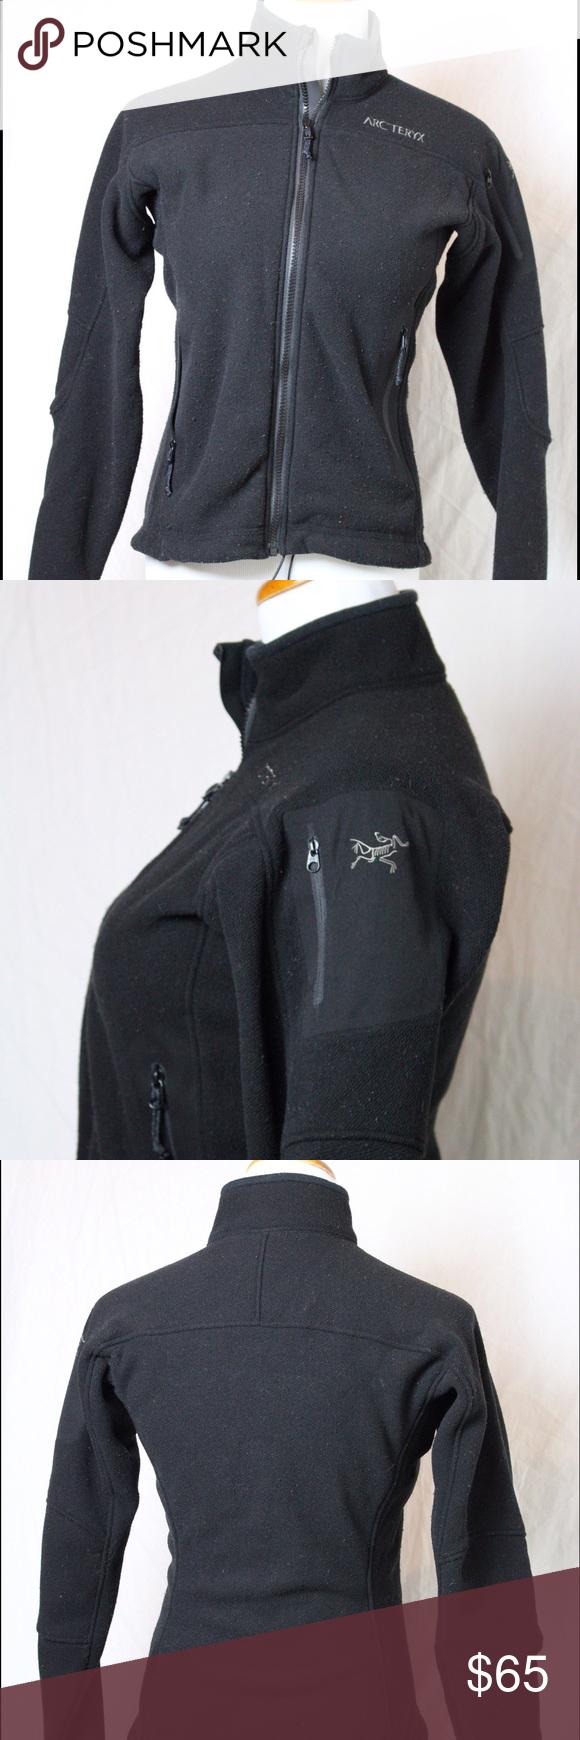 Arc Teryx Women S Small Jacket Women S Small Polartec Technology